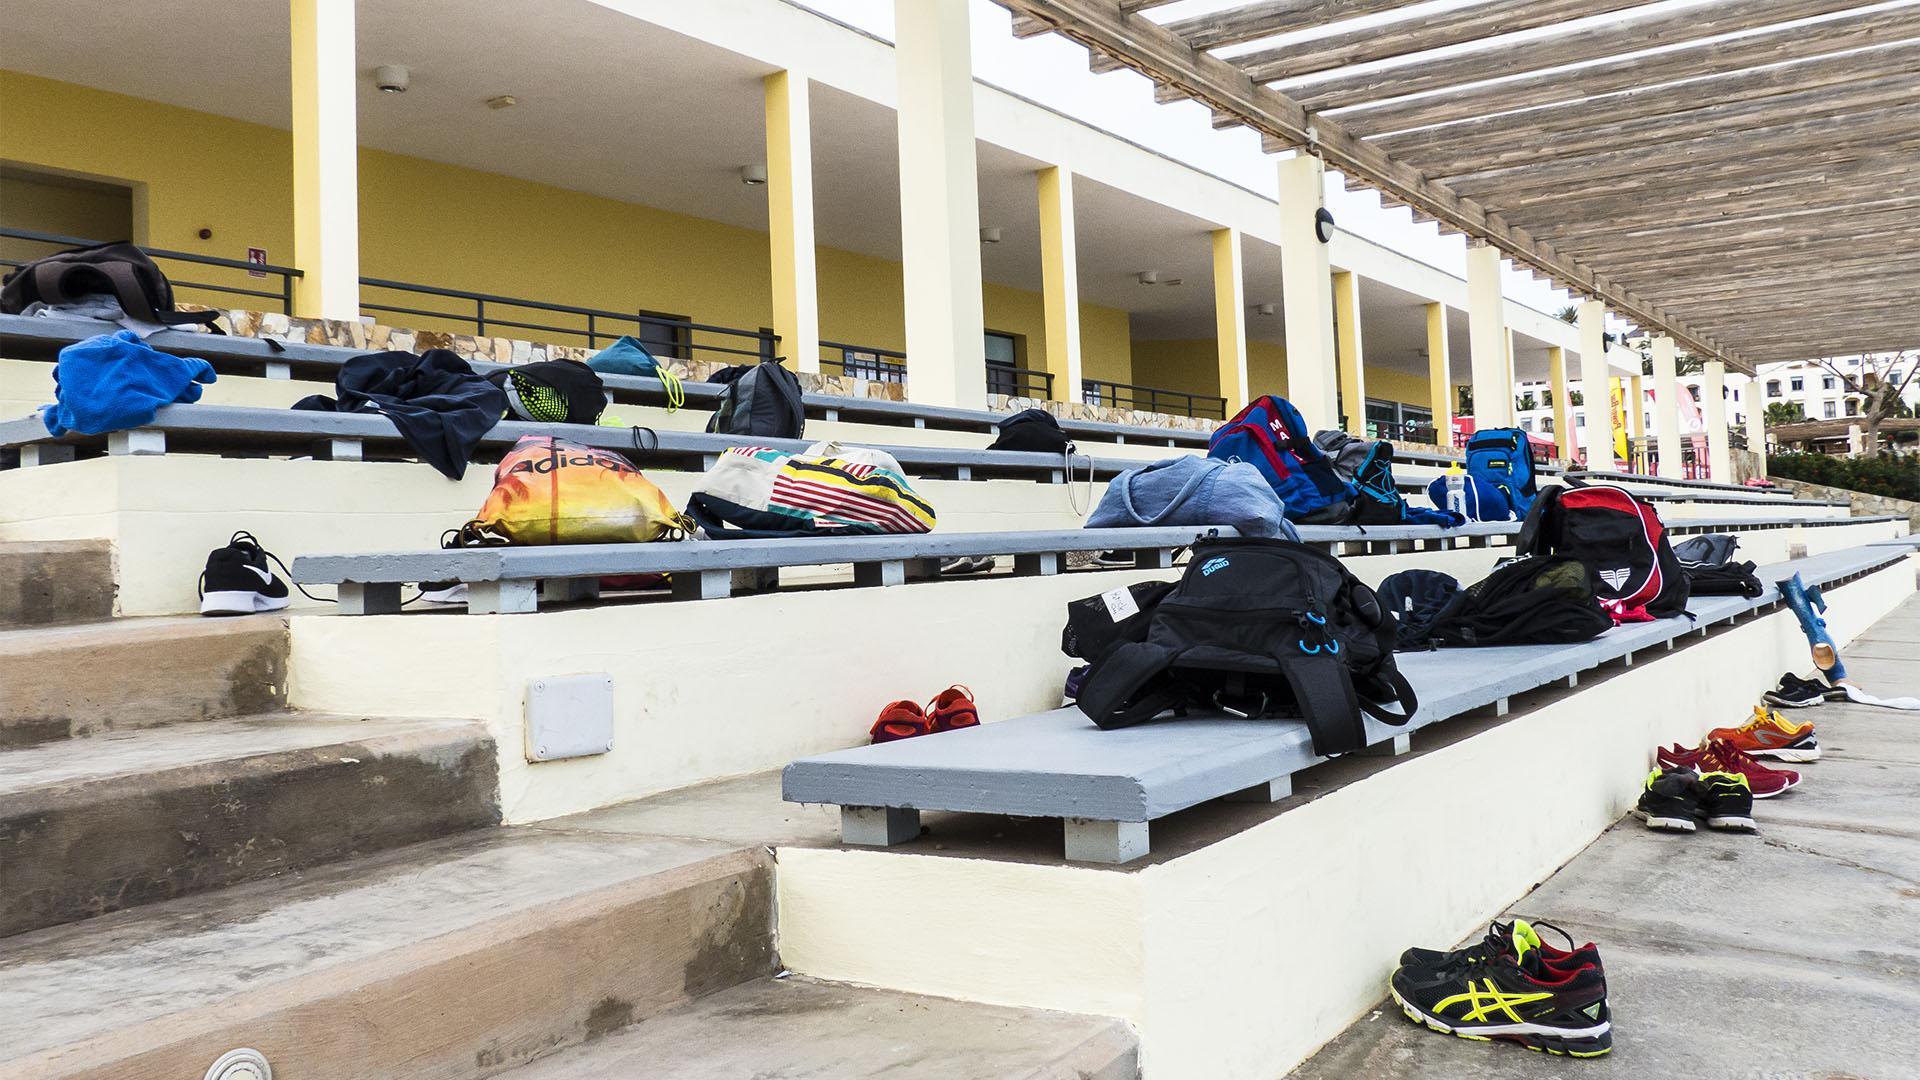 Sport Events Fuerteventura: Challenge Fuerteventura Triathlon Las Playitas.